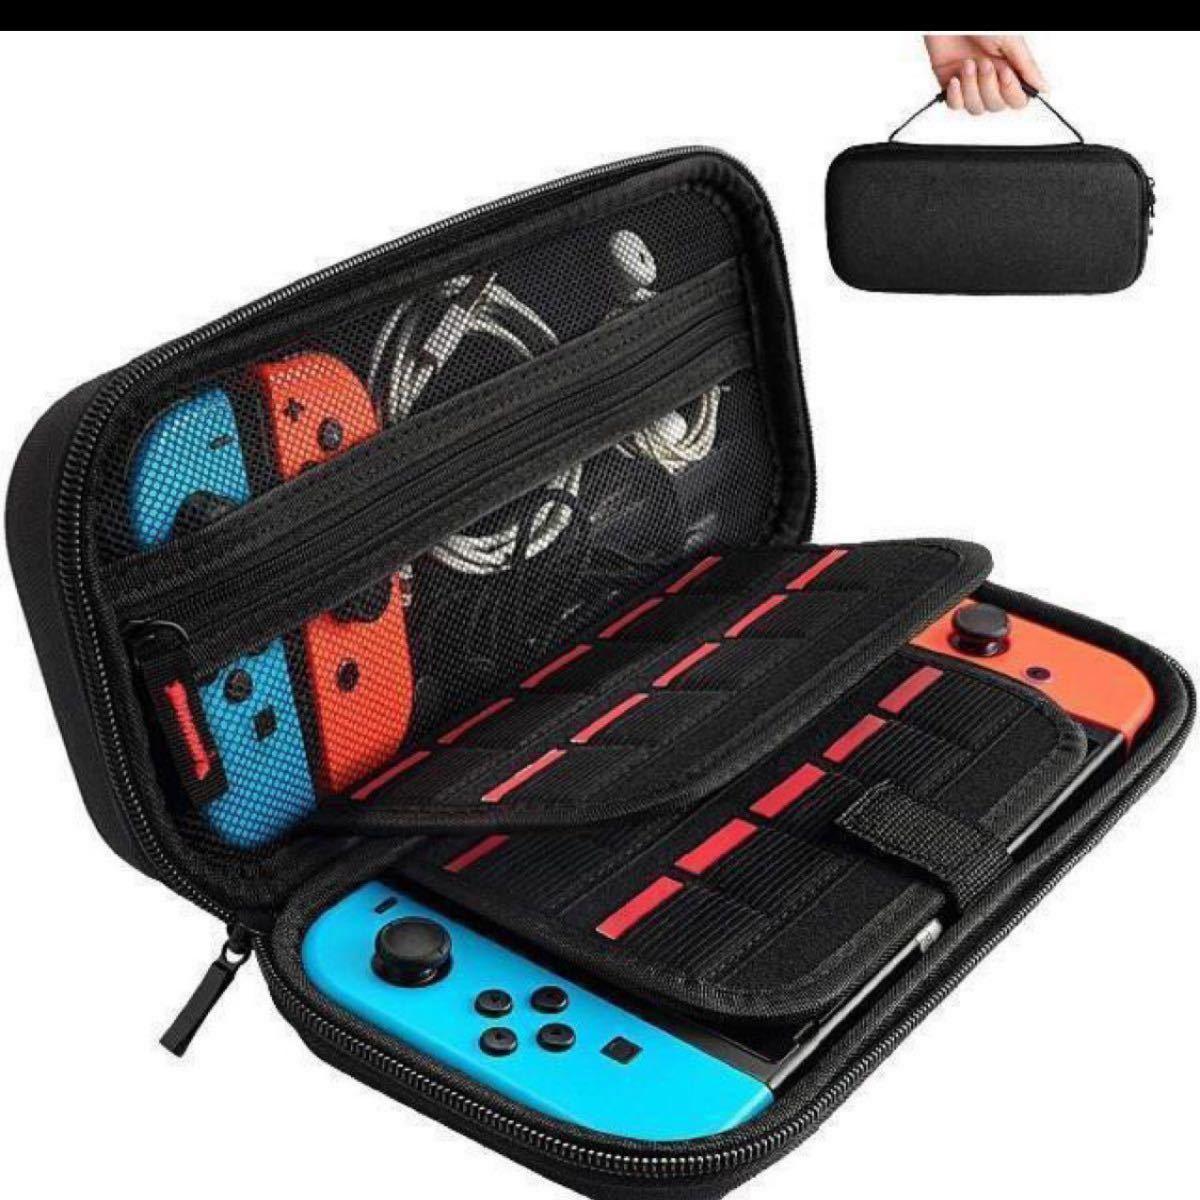 Nintendo Switch 任天堂スイッチ 収納バッグ 任天堂スイッチケース ハードケース